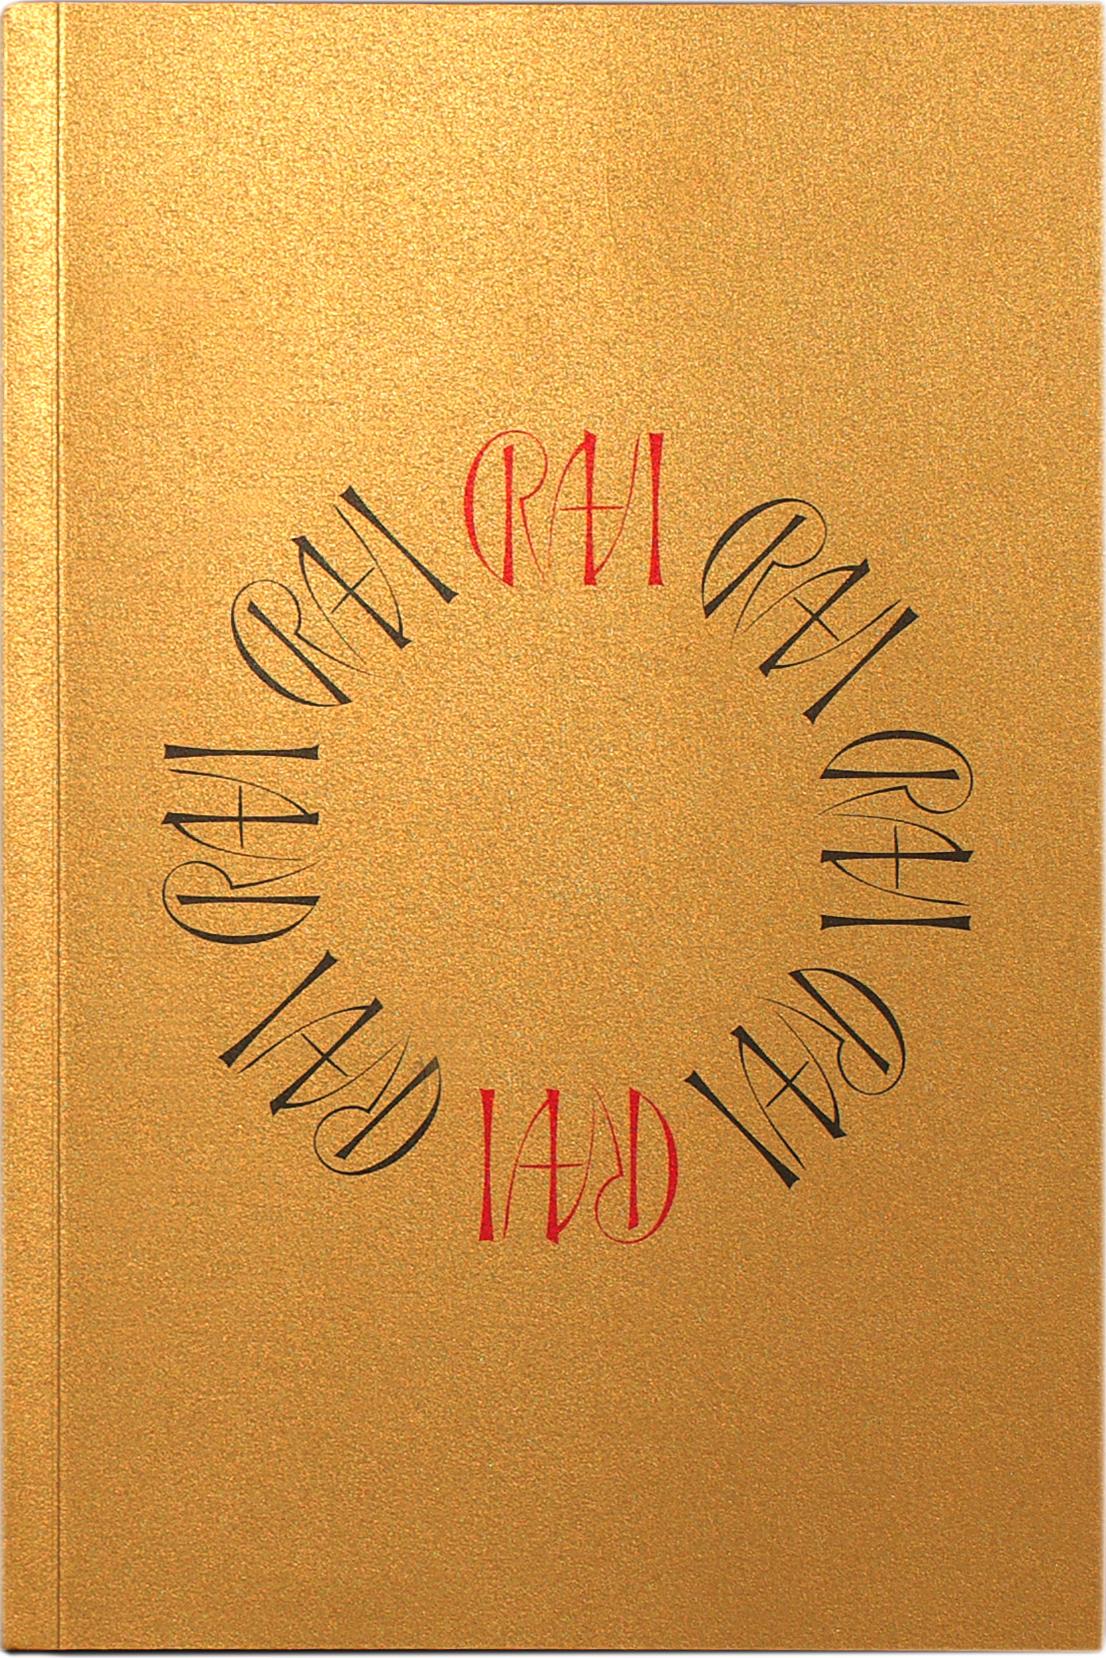 Art catalogue conveying <br>an exhibition - Duplicate